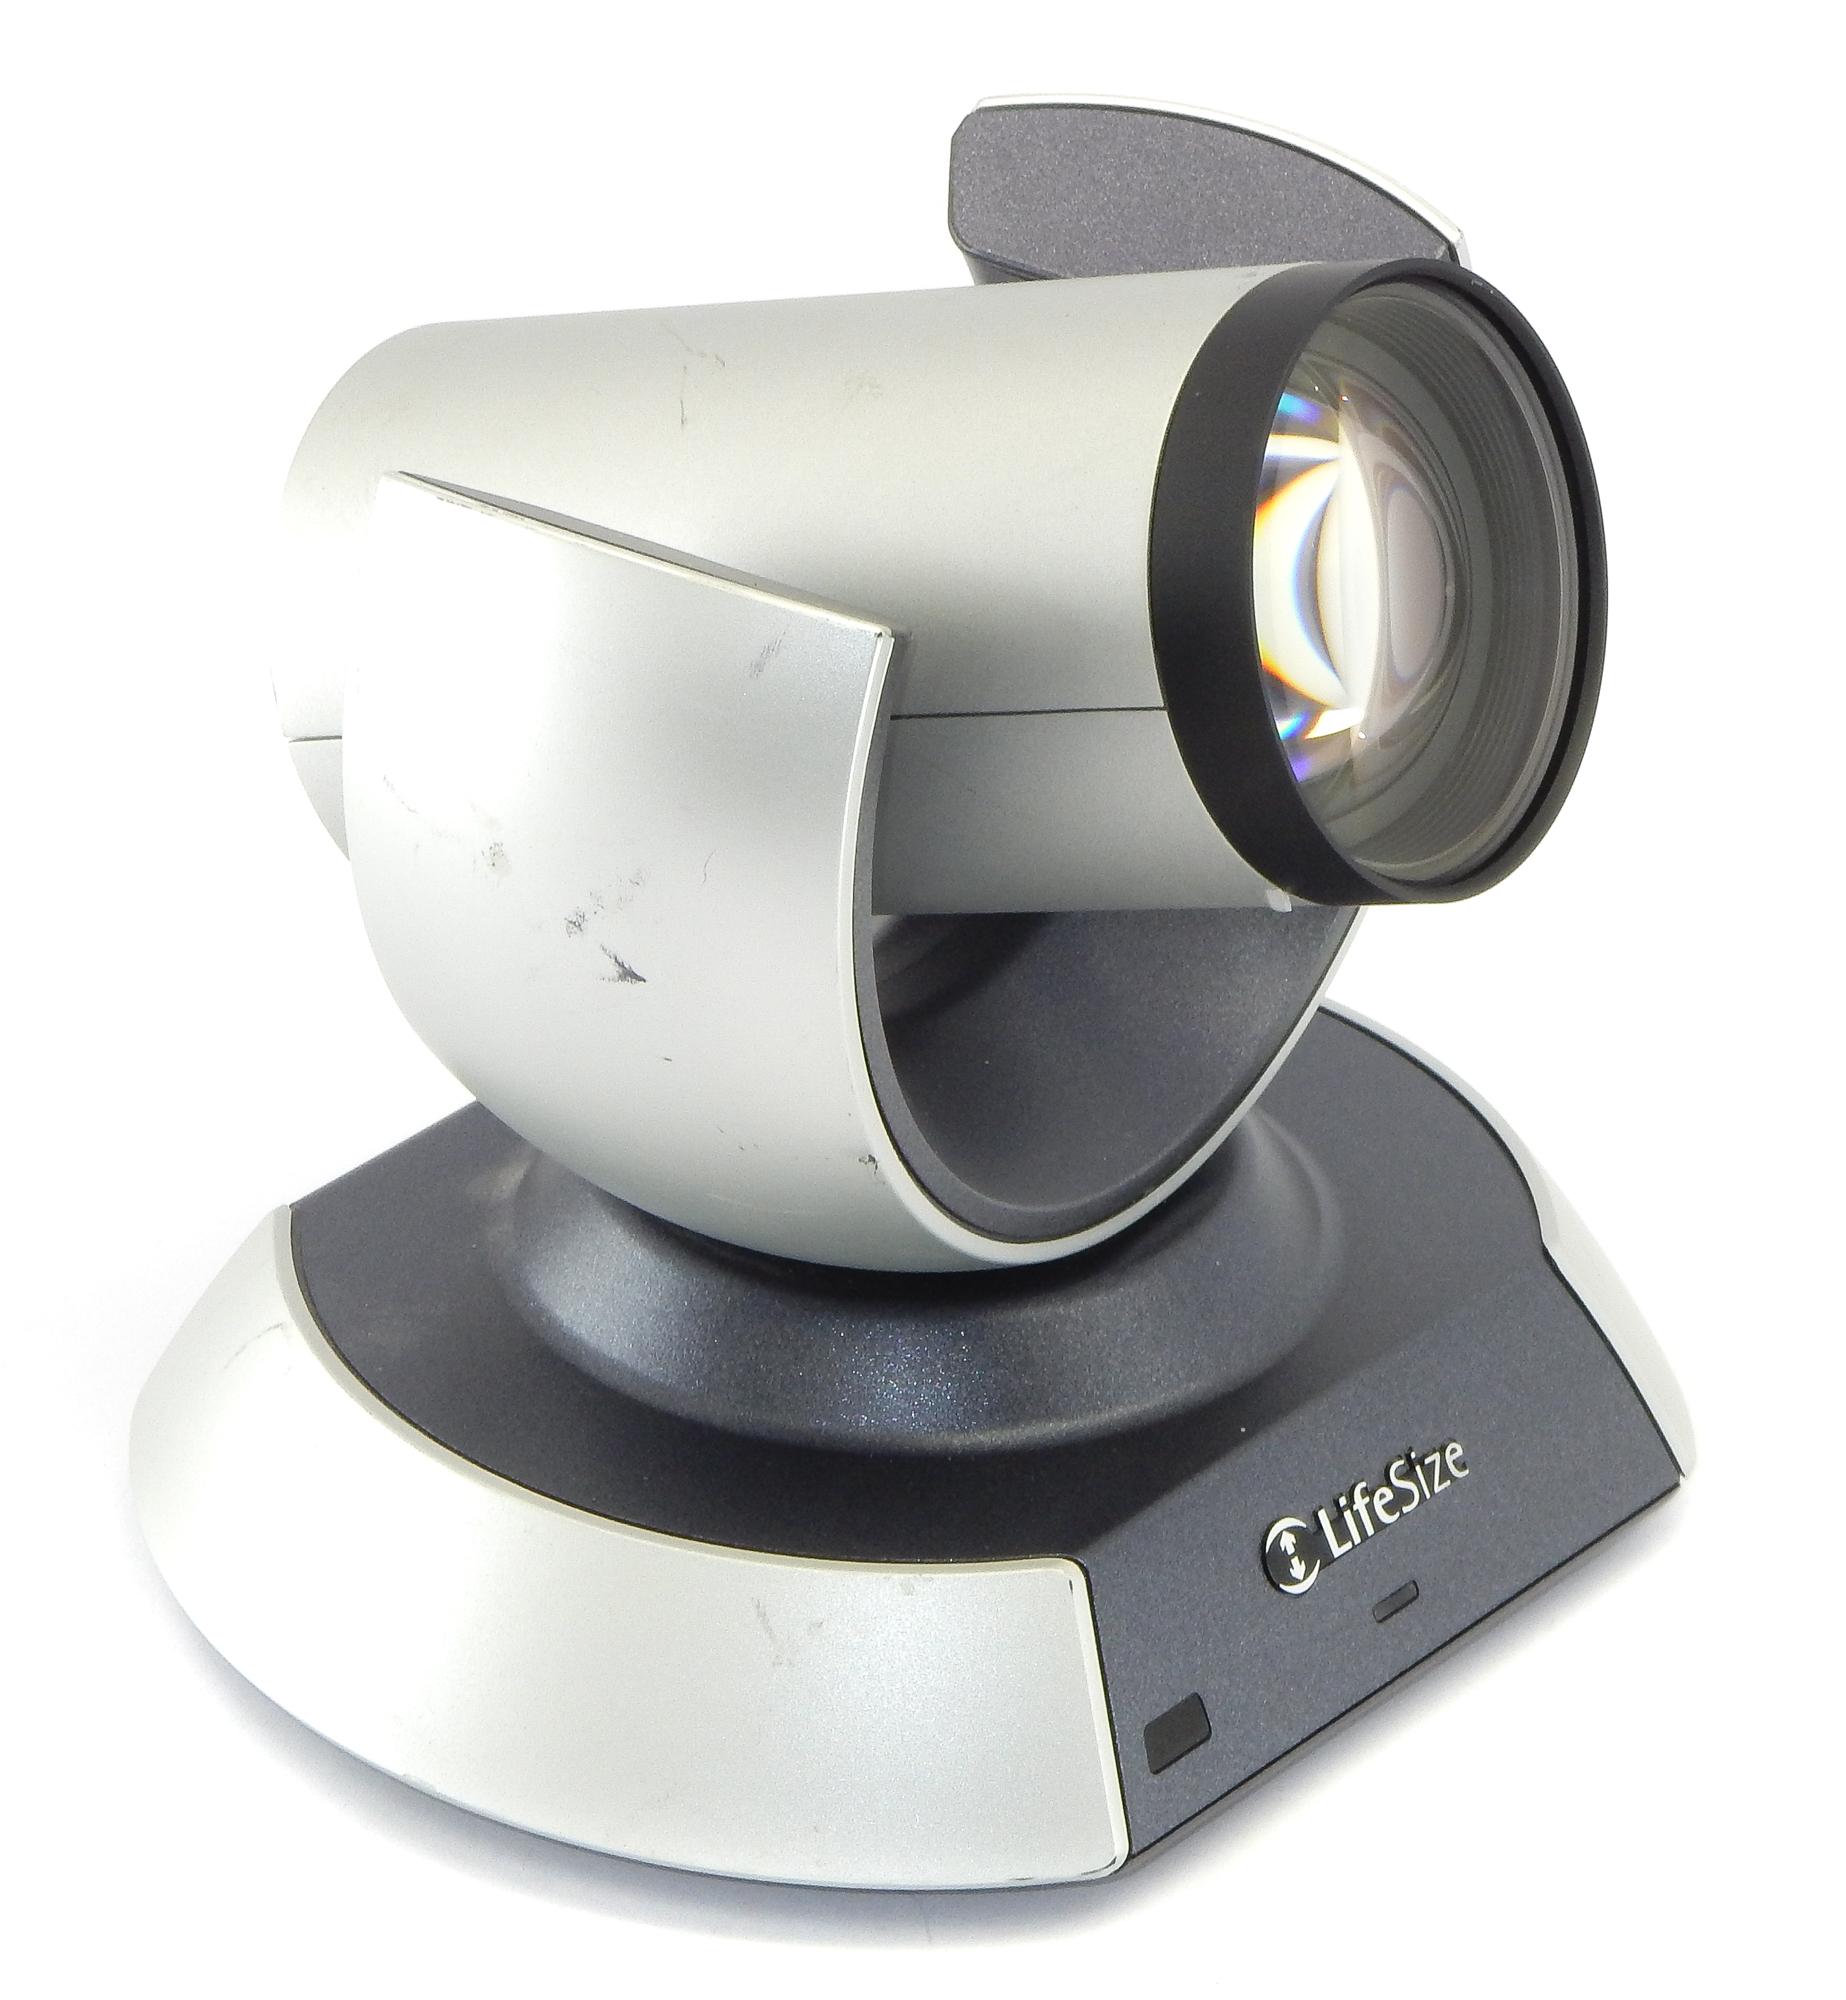 LifeSize Camera 10x Video Conferencing System Motorized Camera Model LFZ-019